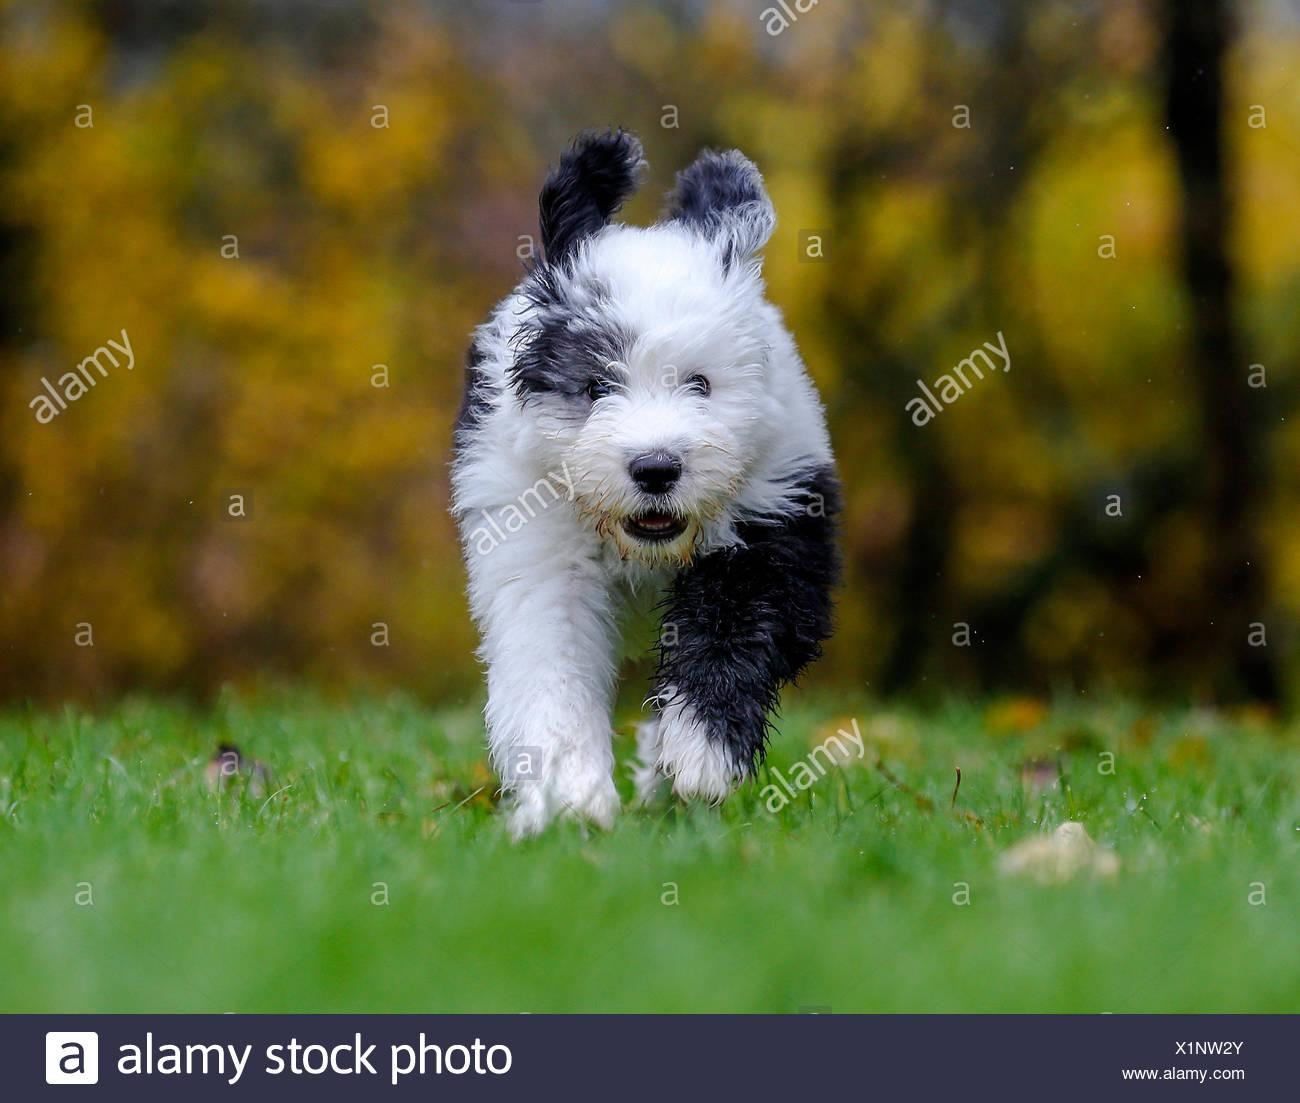 Puppy, 12 weeks, Old English Sheepdog Stock Photo: 276461219